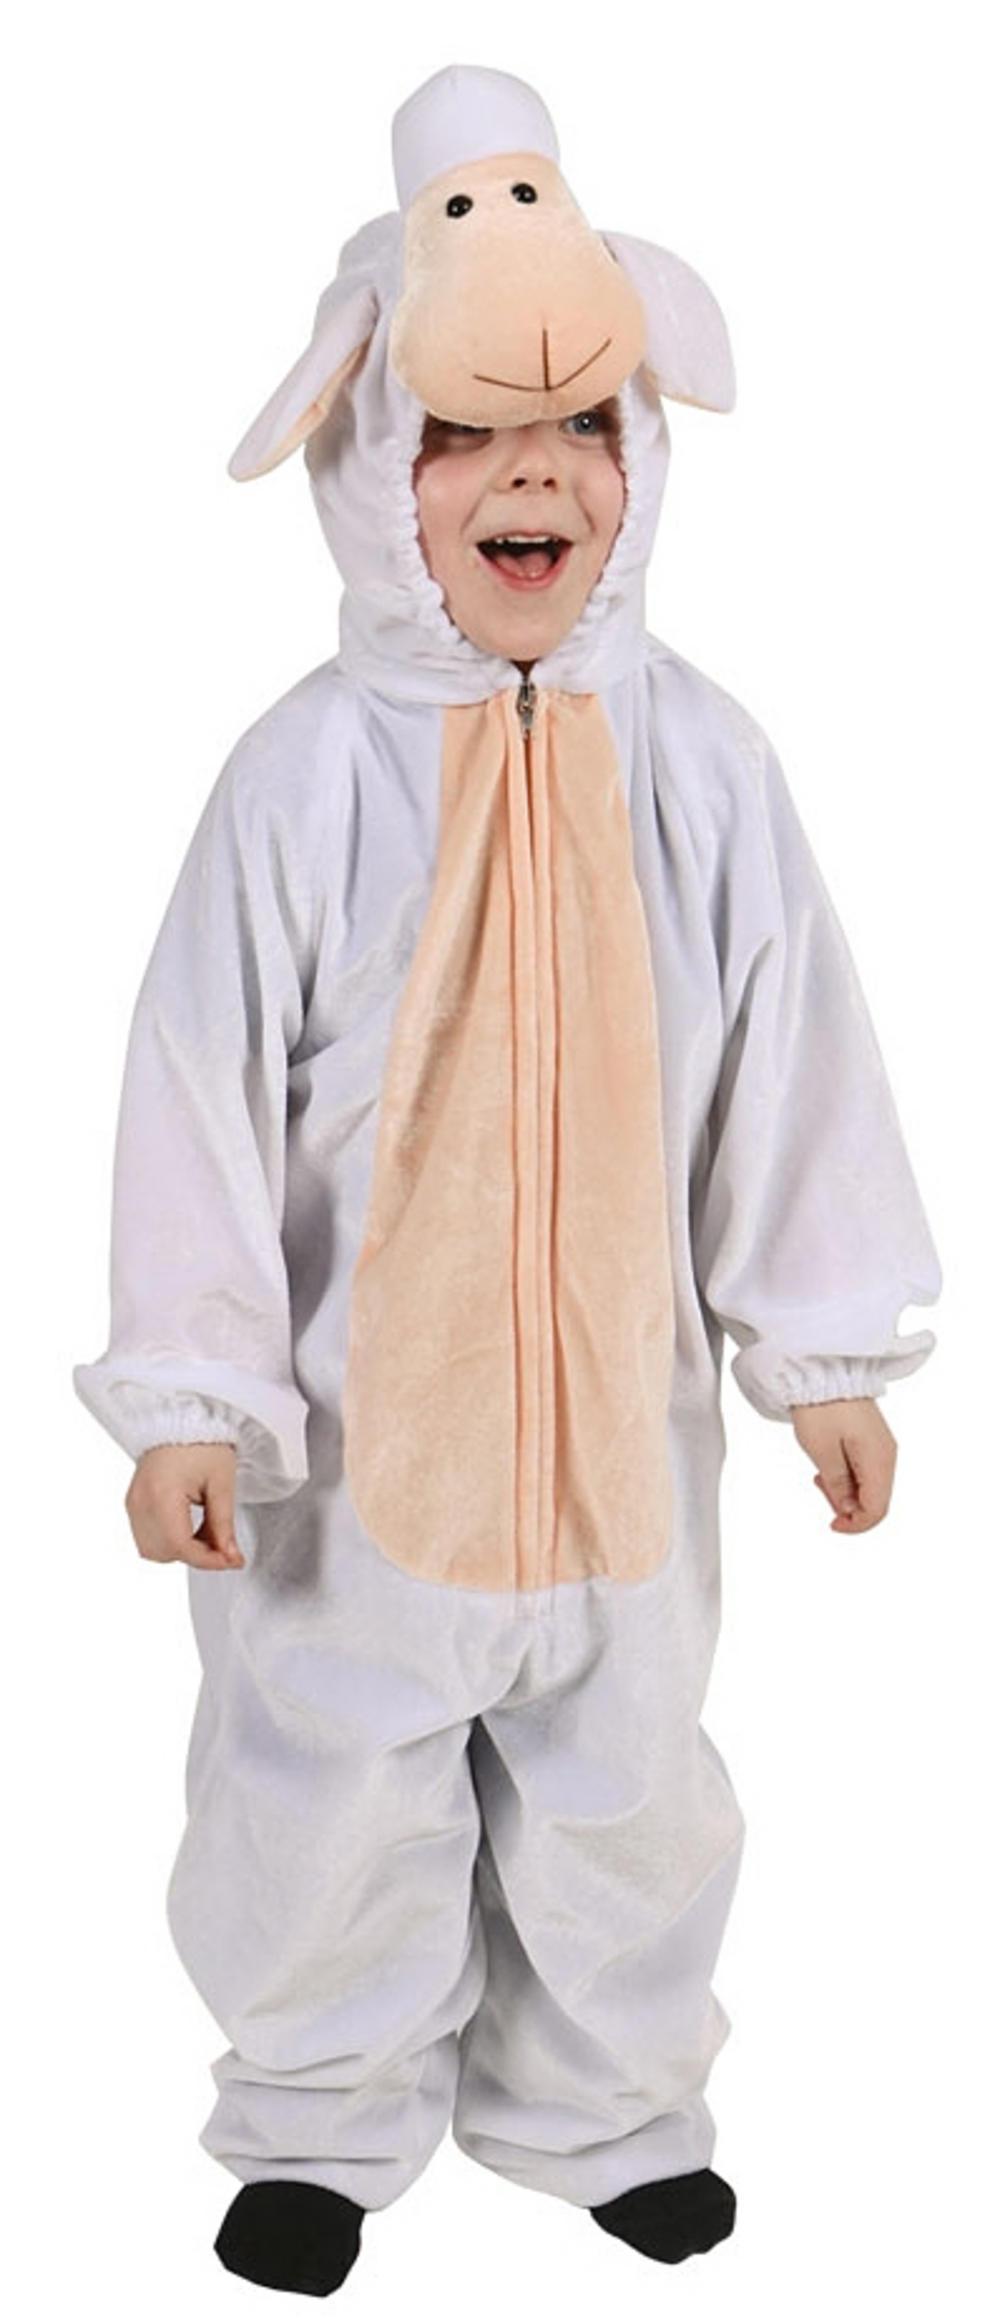 Kids Little Lamb Costume